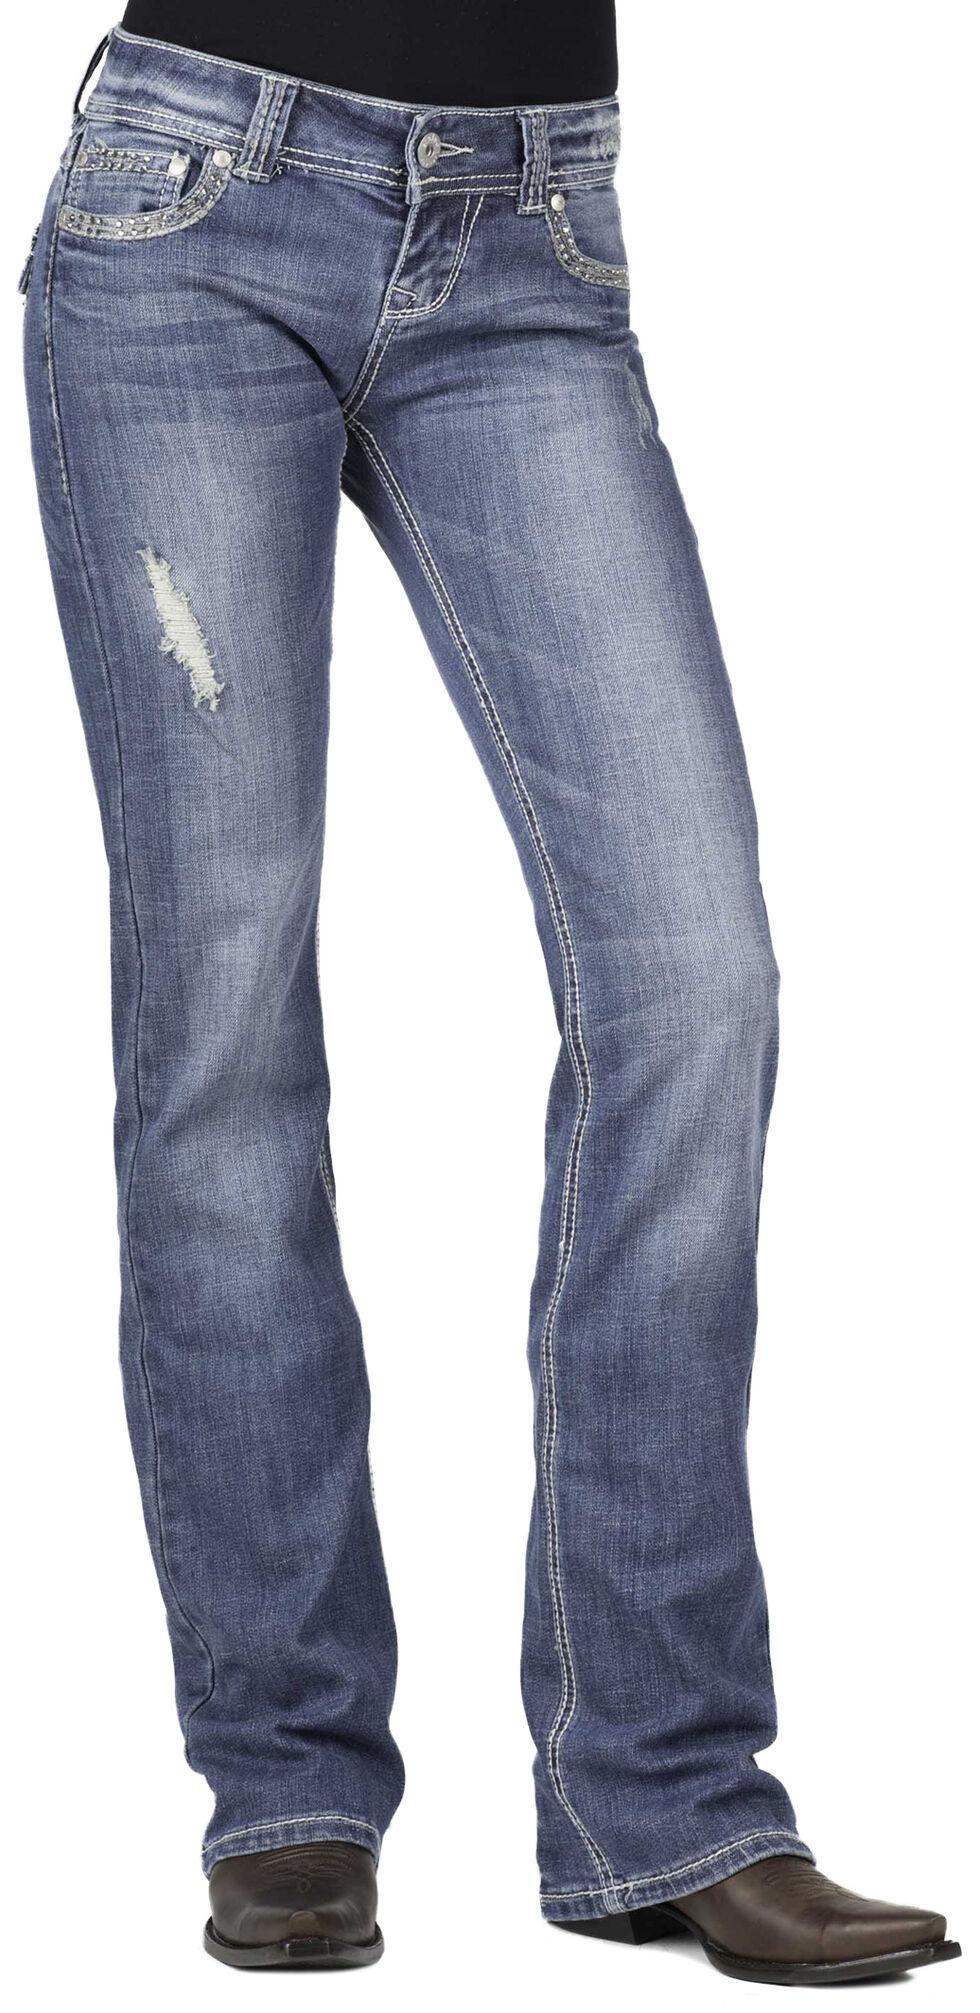 Stetson Women's 818 Rhinestone Boot Cut Jeans, Denim, hi-res